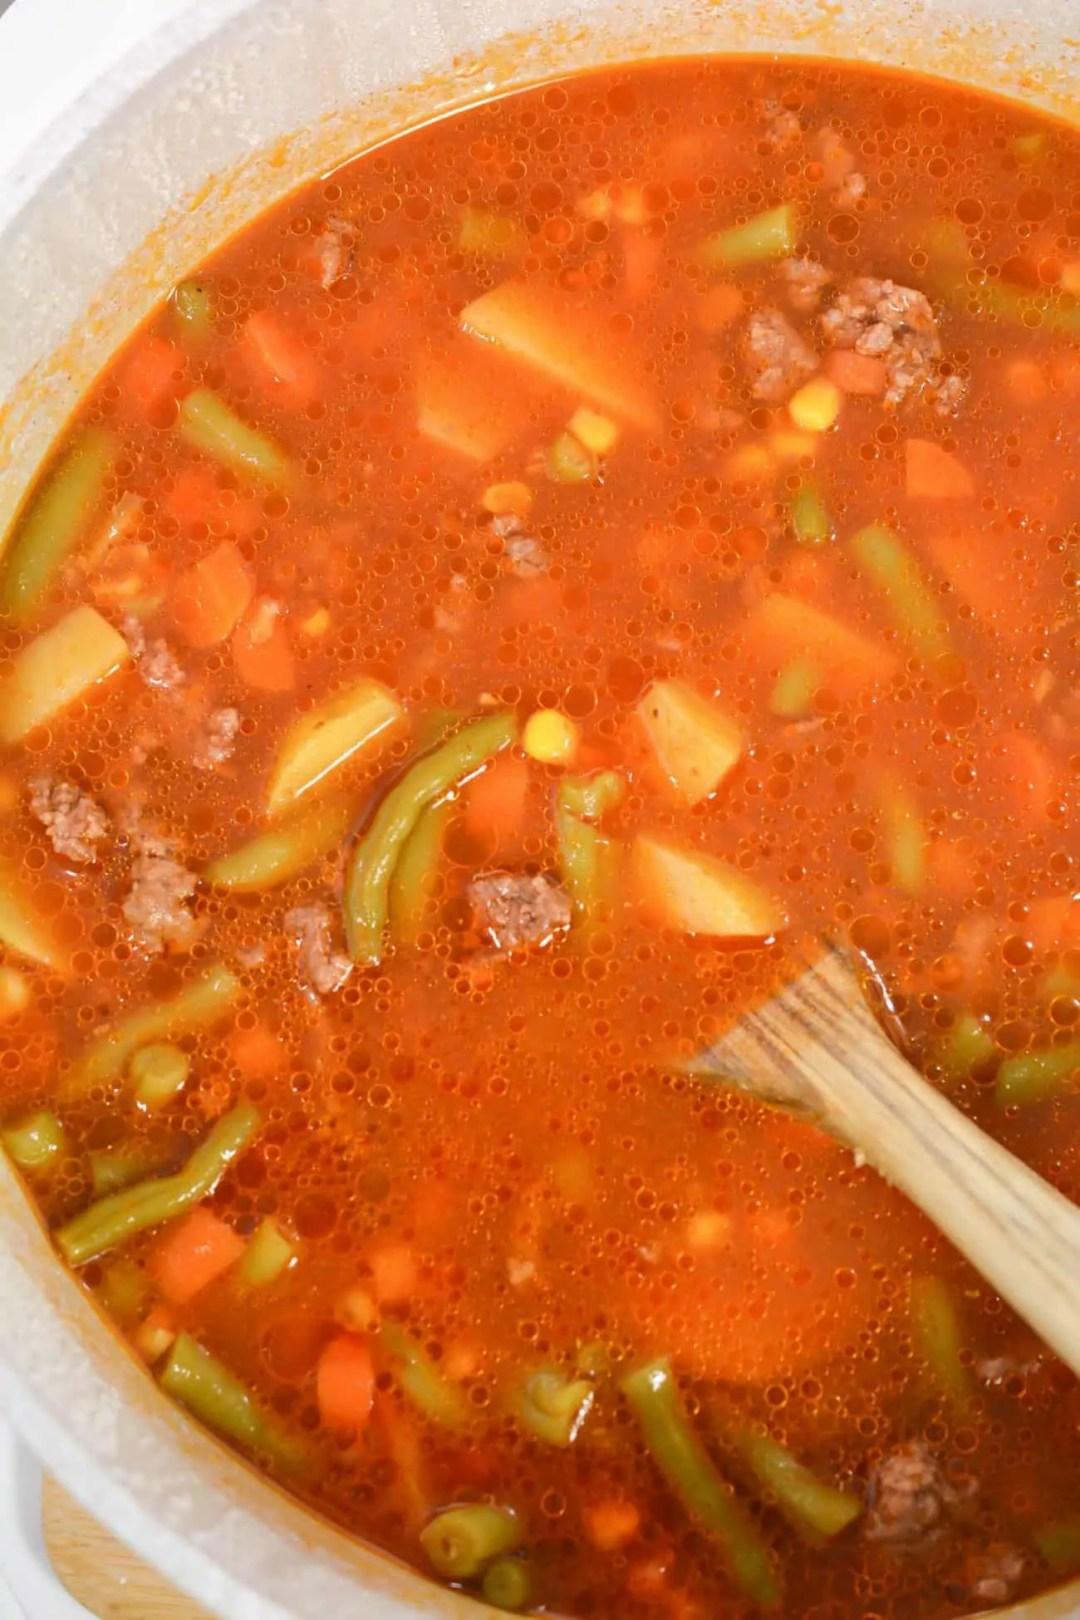 Grandma's Hamburger and Vegetable Soup